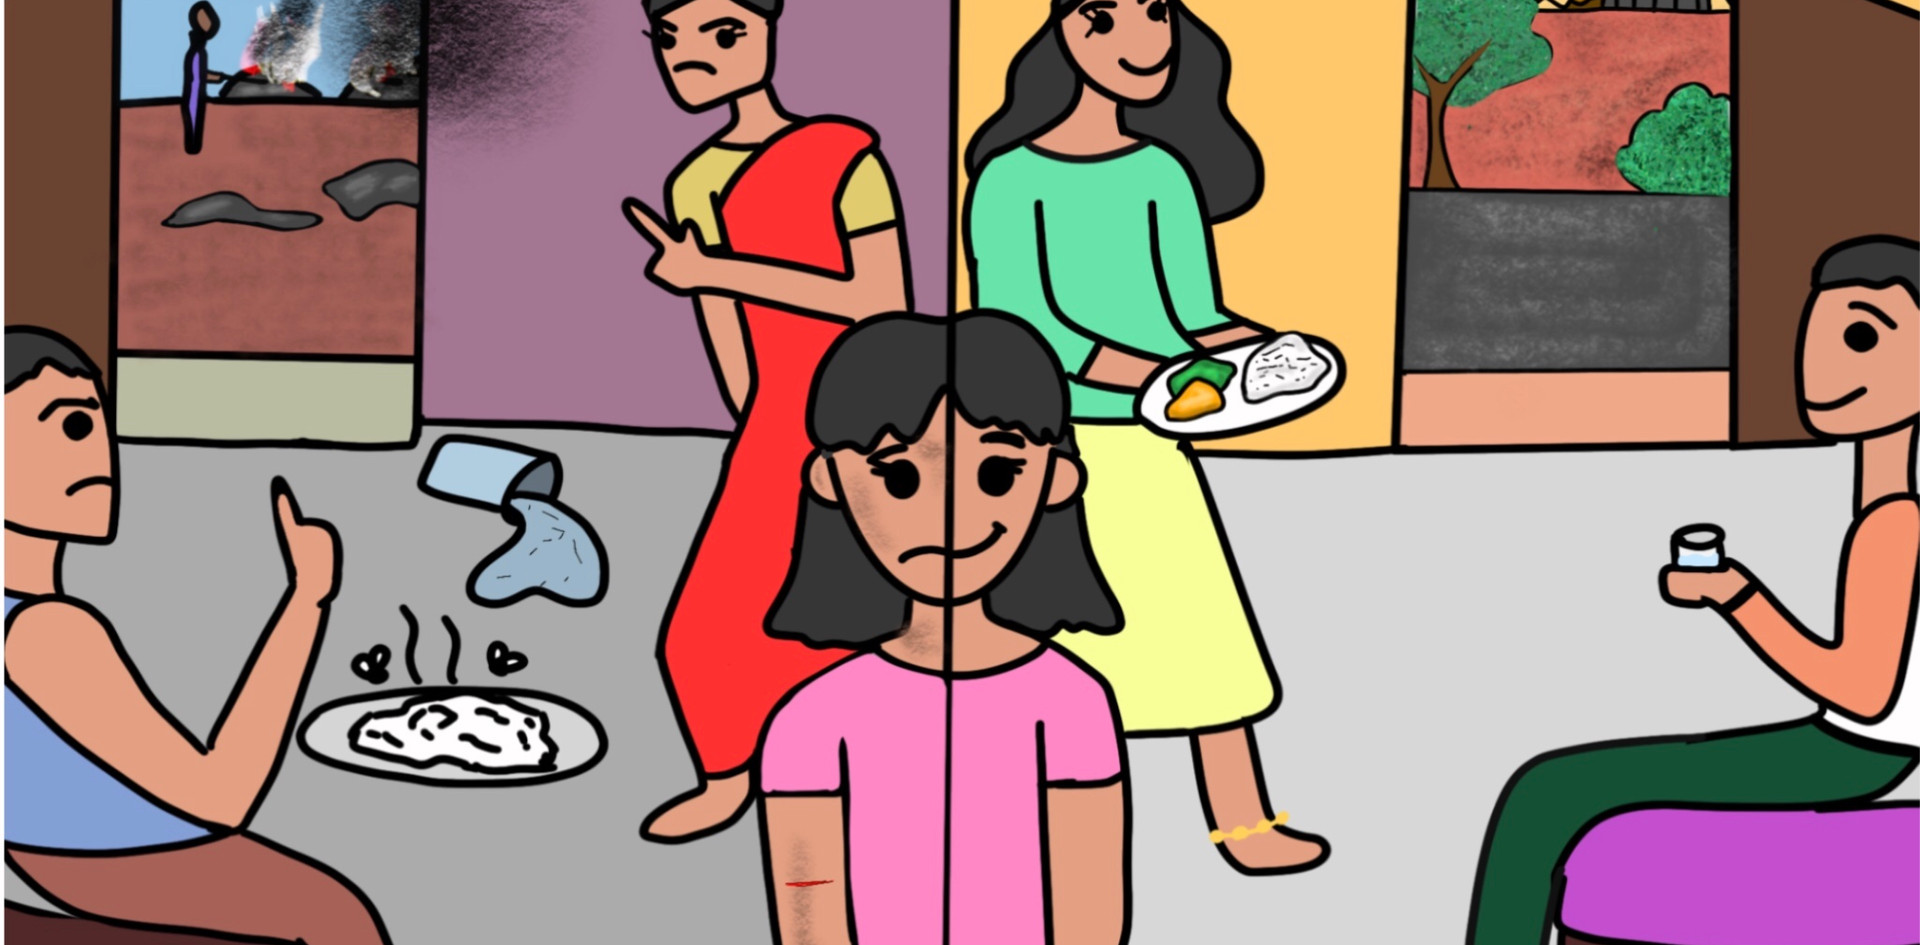 Regulation of Nutrition on Children's Development - © Senthilkumar Rajagopal